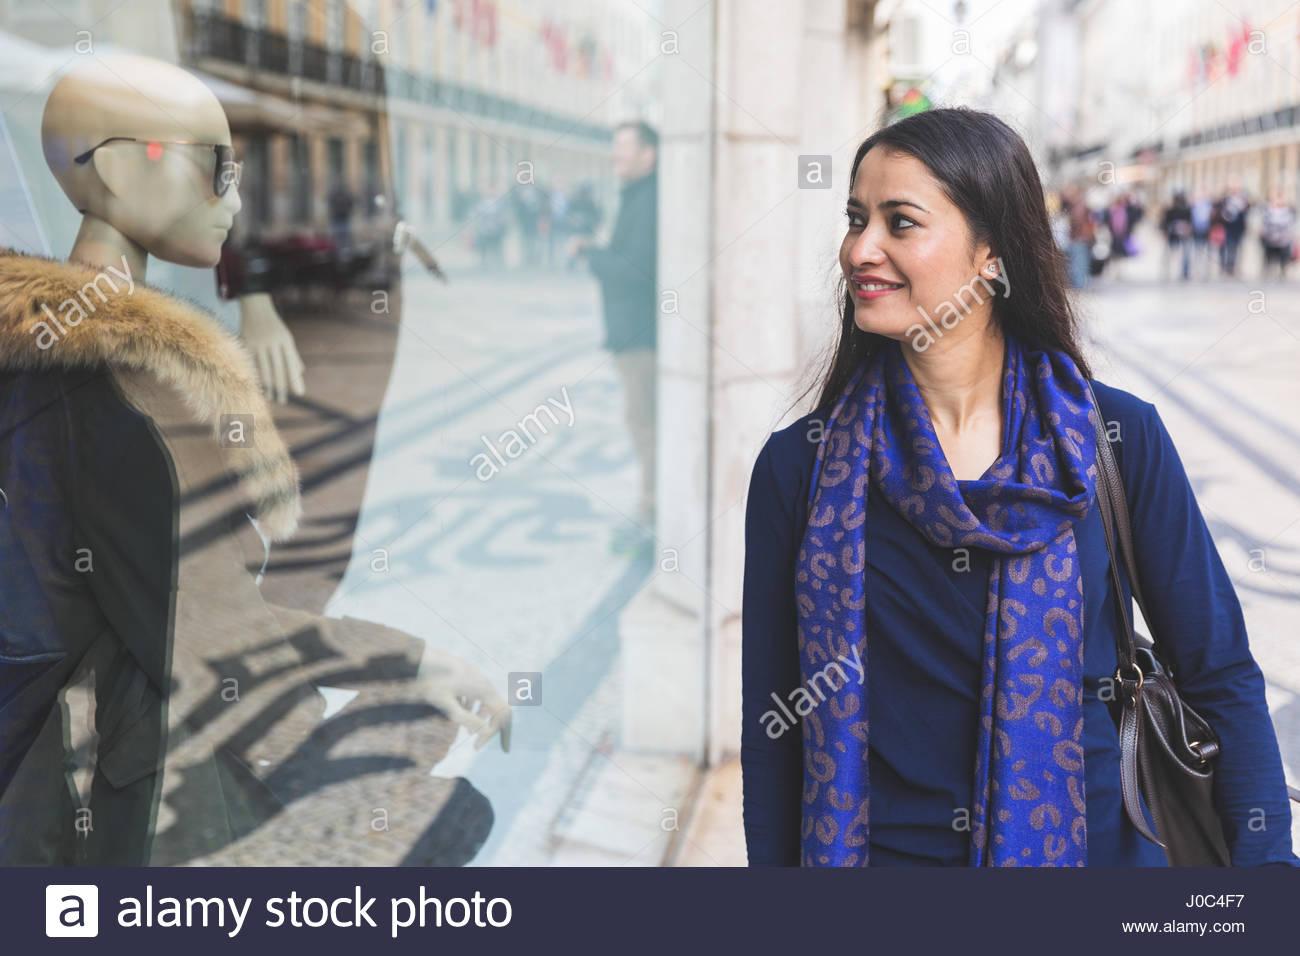 Woman window shopping, Lisbon, Portugal - Stock Image